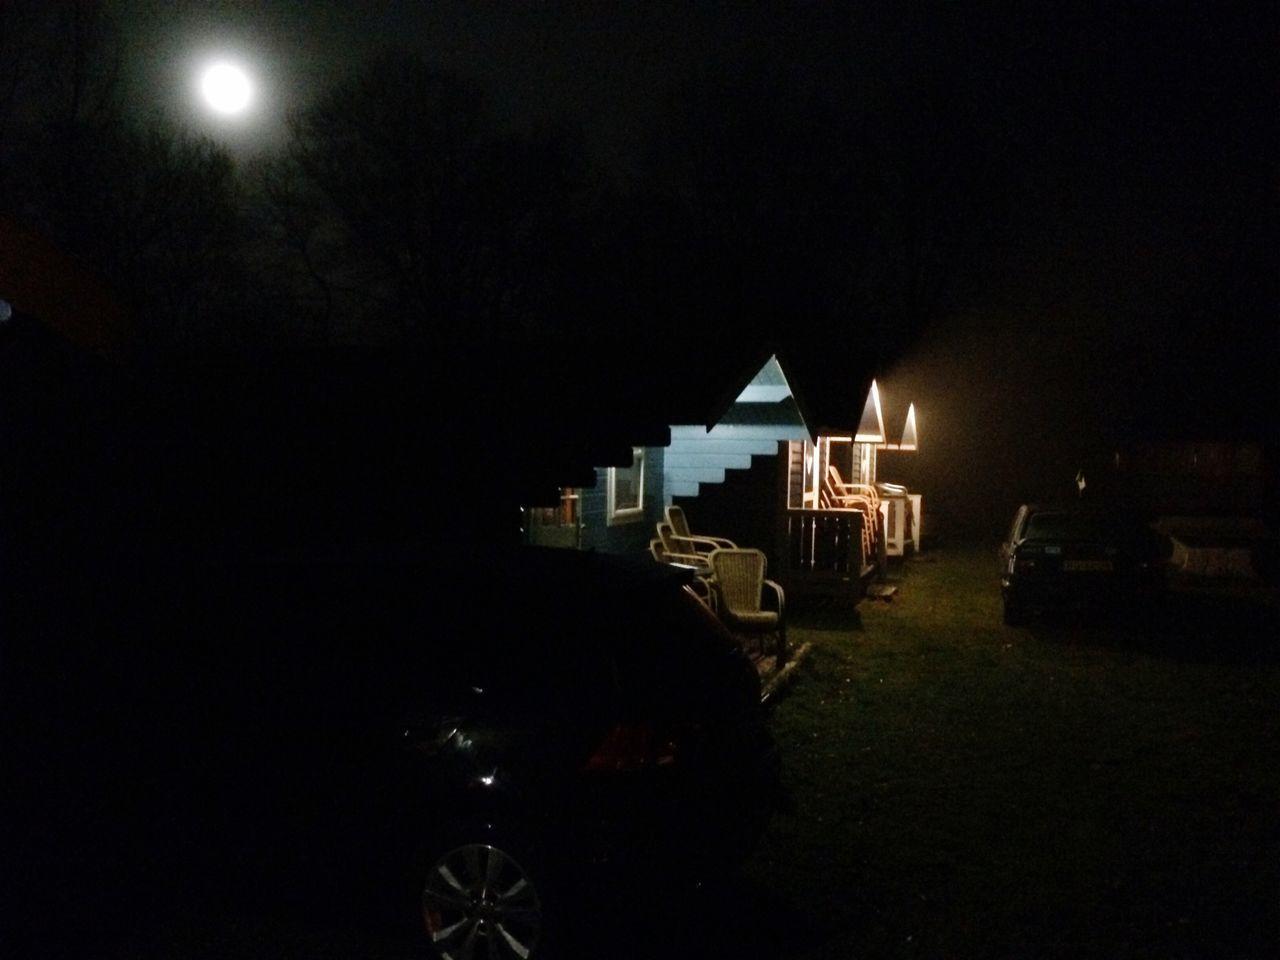 Our cabins under the moonlight. Hilversum Hurricanes Baseball Team Teamuitje2016 Cabin Moon Moonlight IPhoneography Night Nightphotography